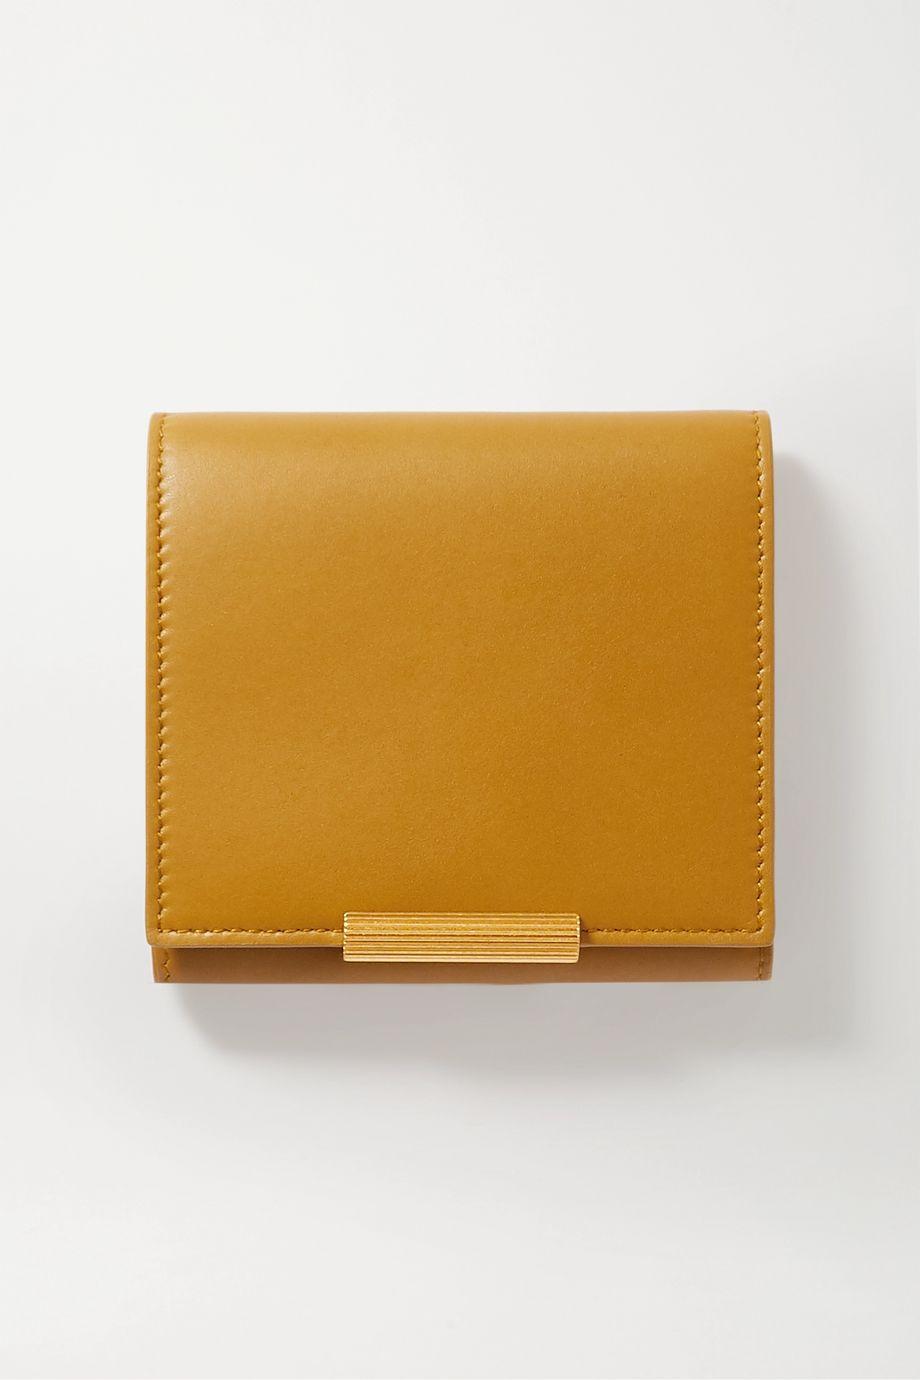 Bottega Veneta Embellished leather wallet